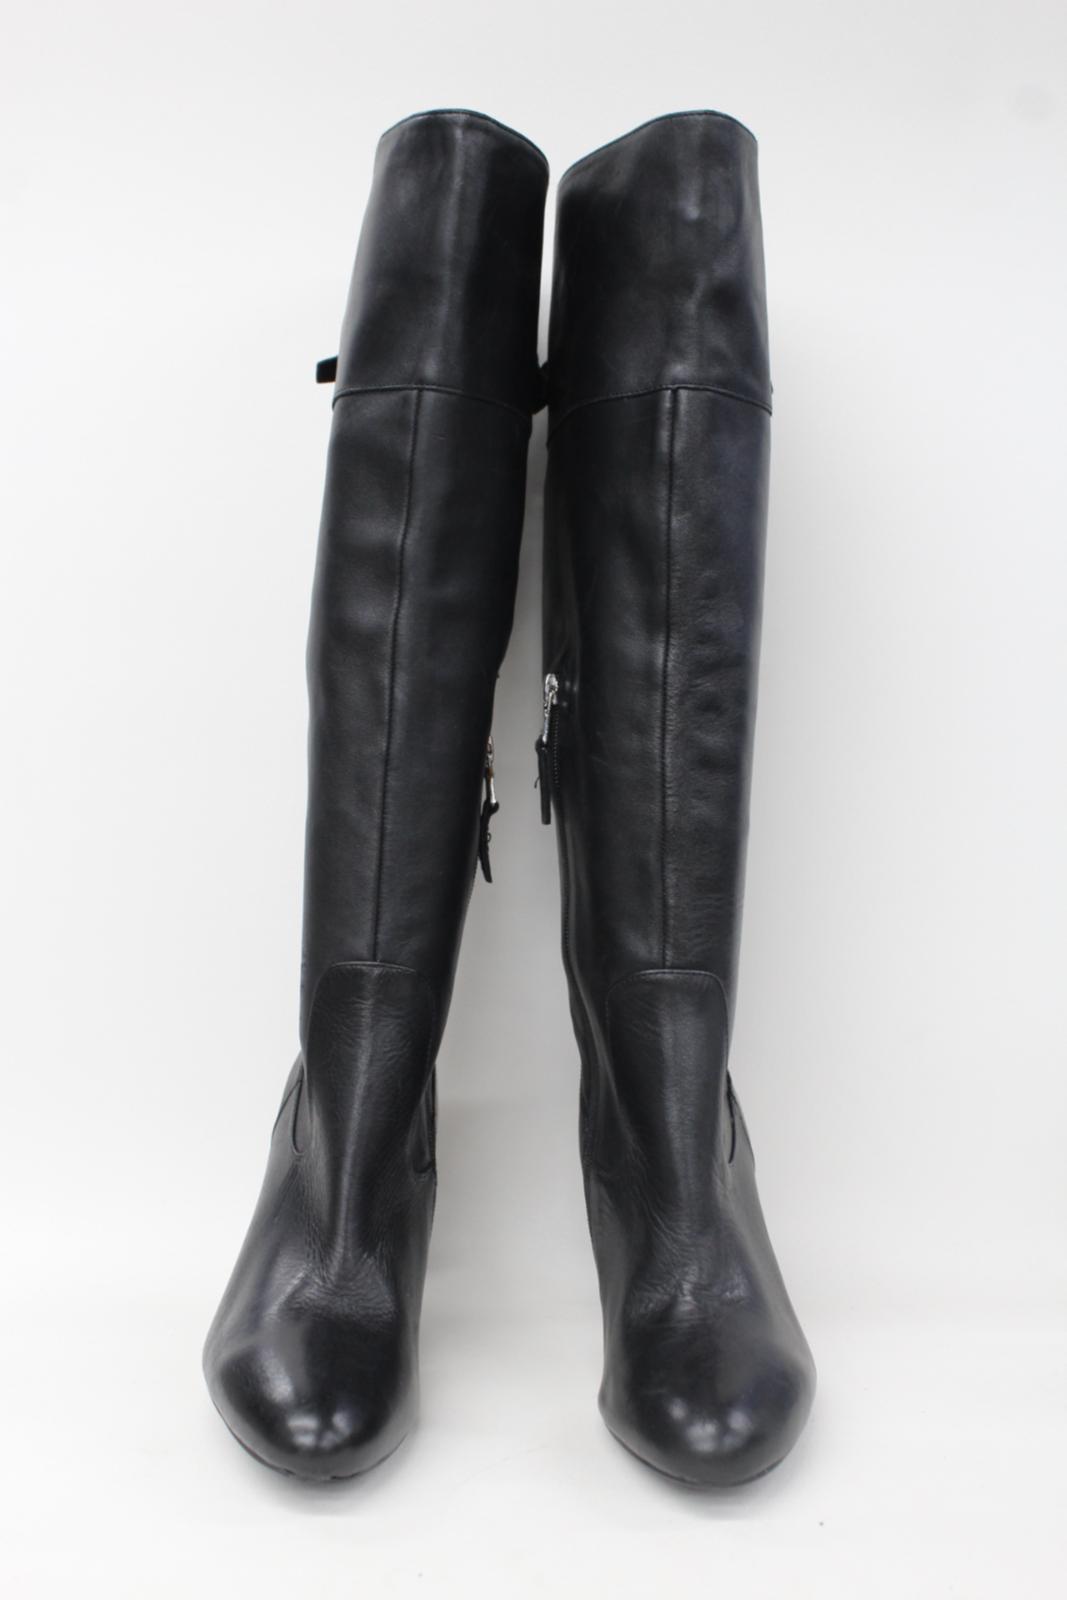 Ladies Ralph Black Leather Lauren Us9b Uk7 Knee Boots Heeled Size High T77q5